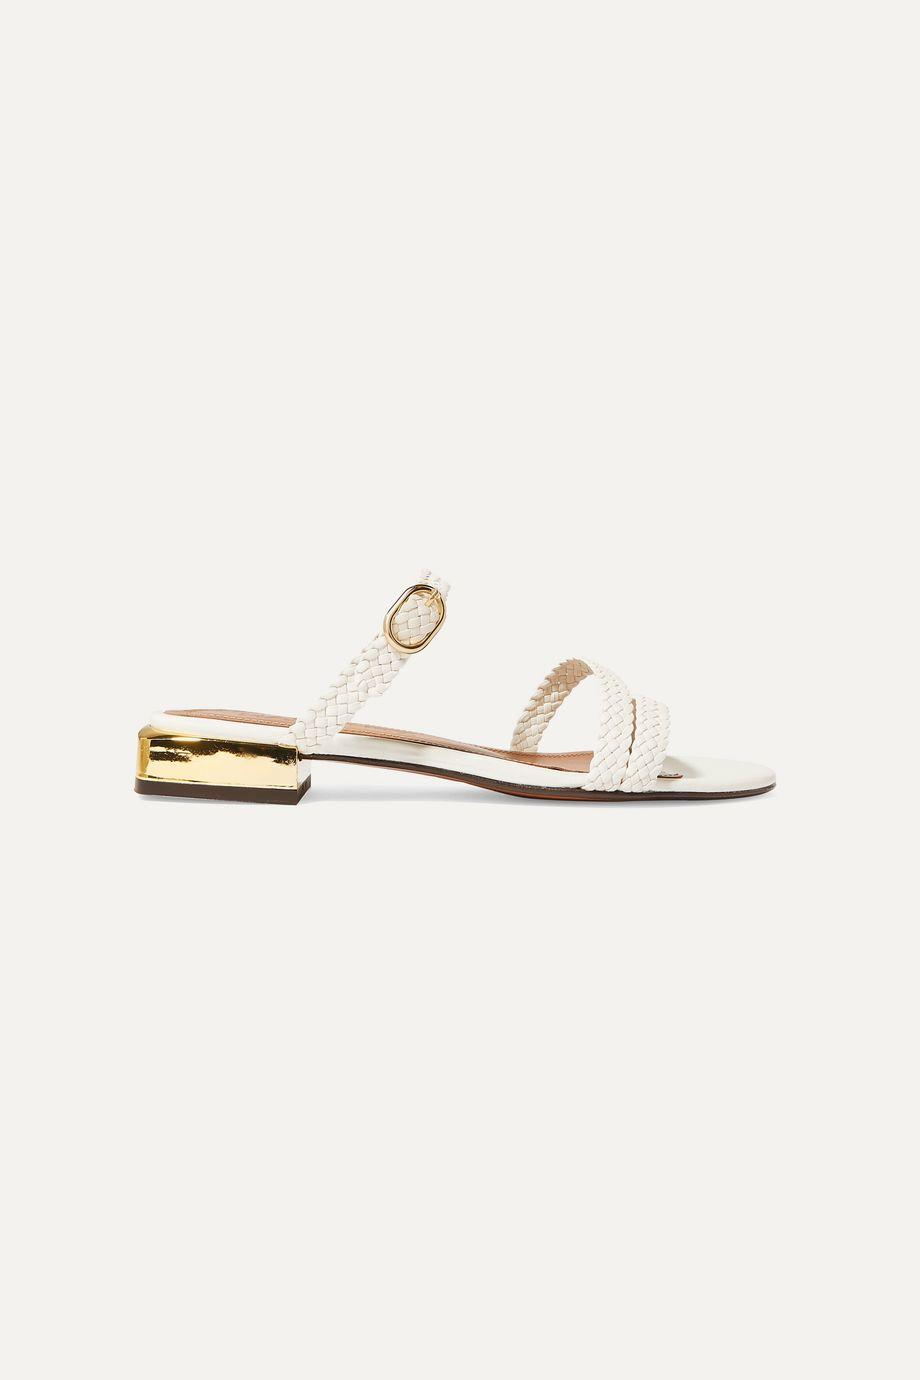 Souliers Martinez Granada braided leather sandals